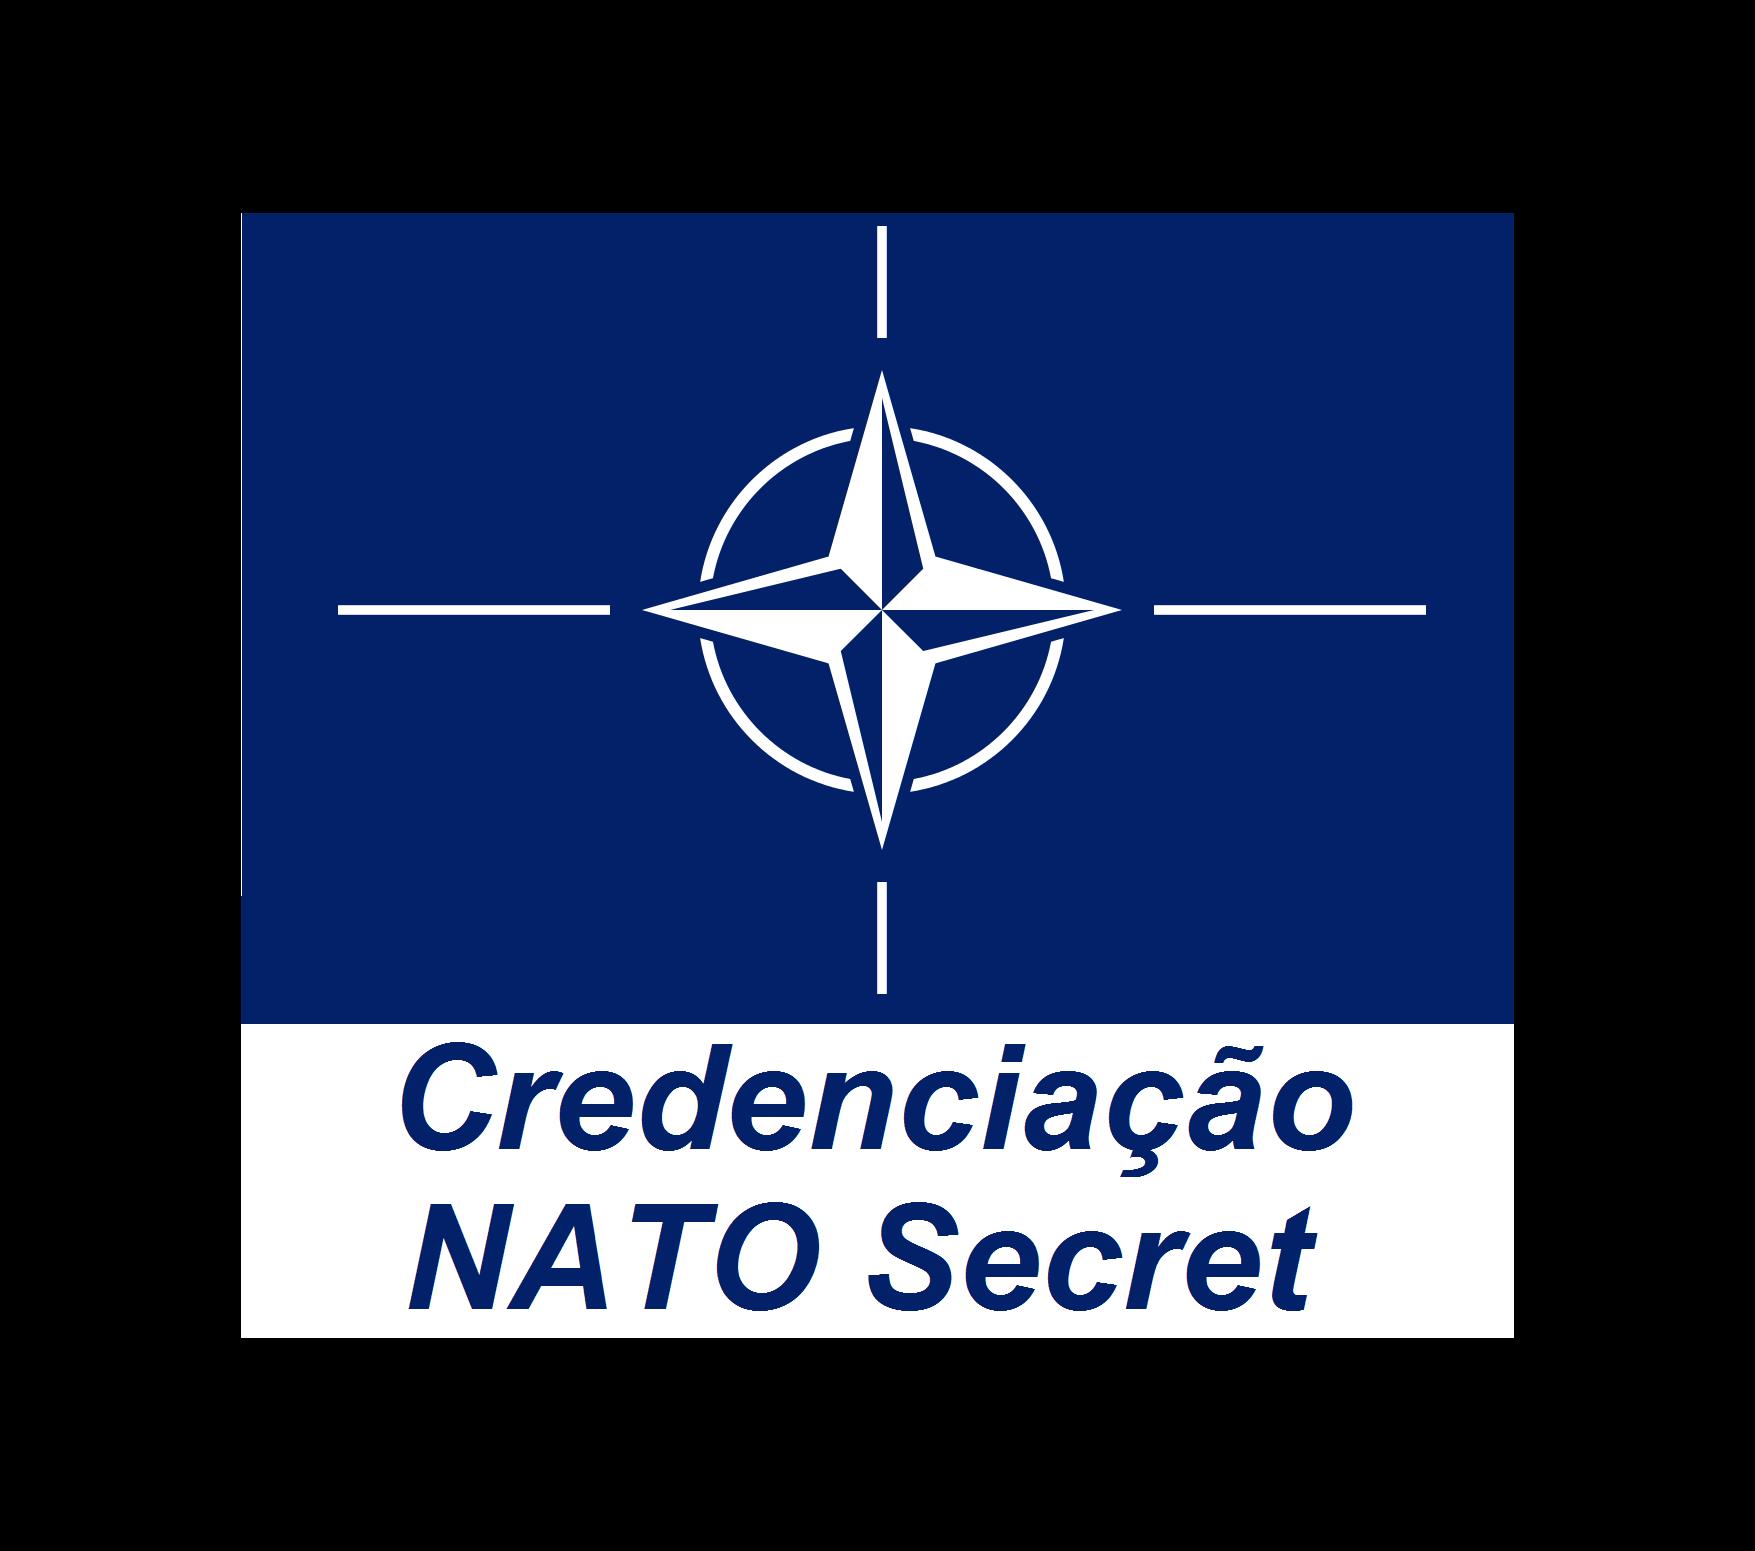 NATO SECRET_2.png